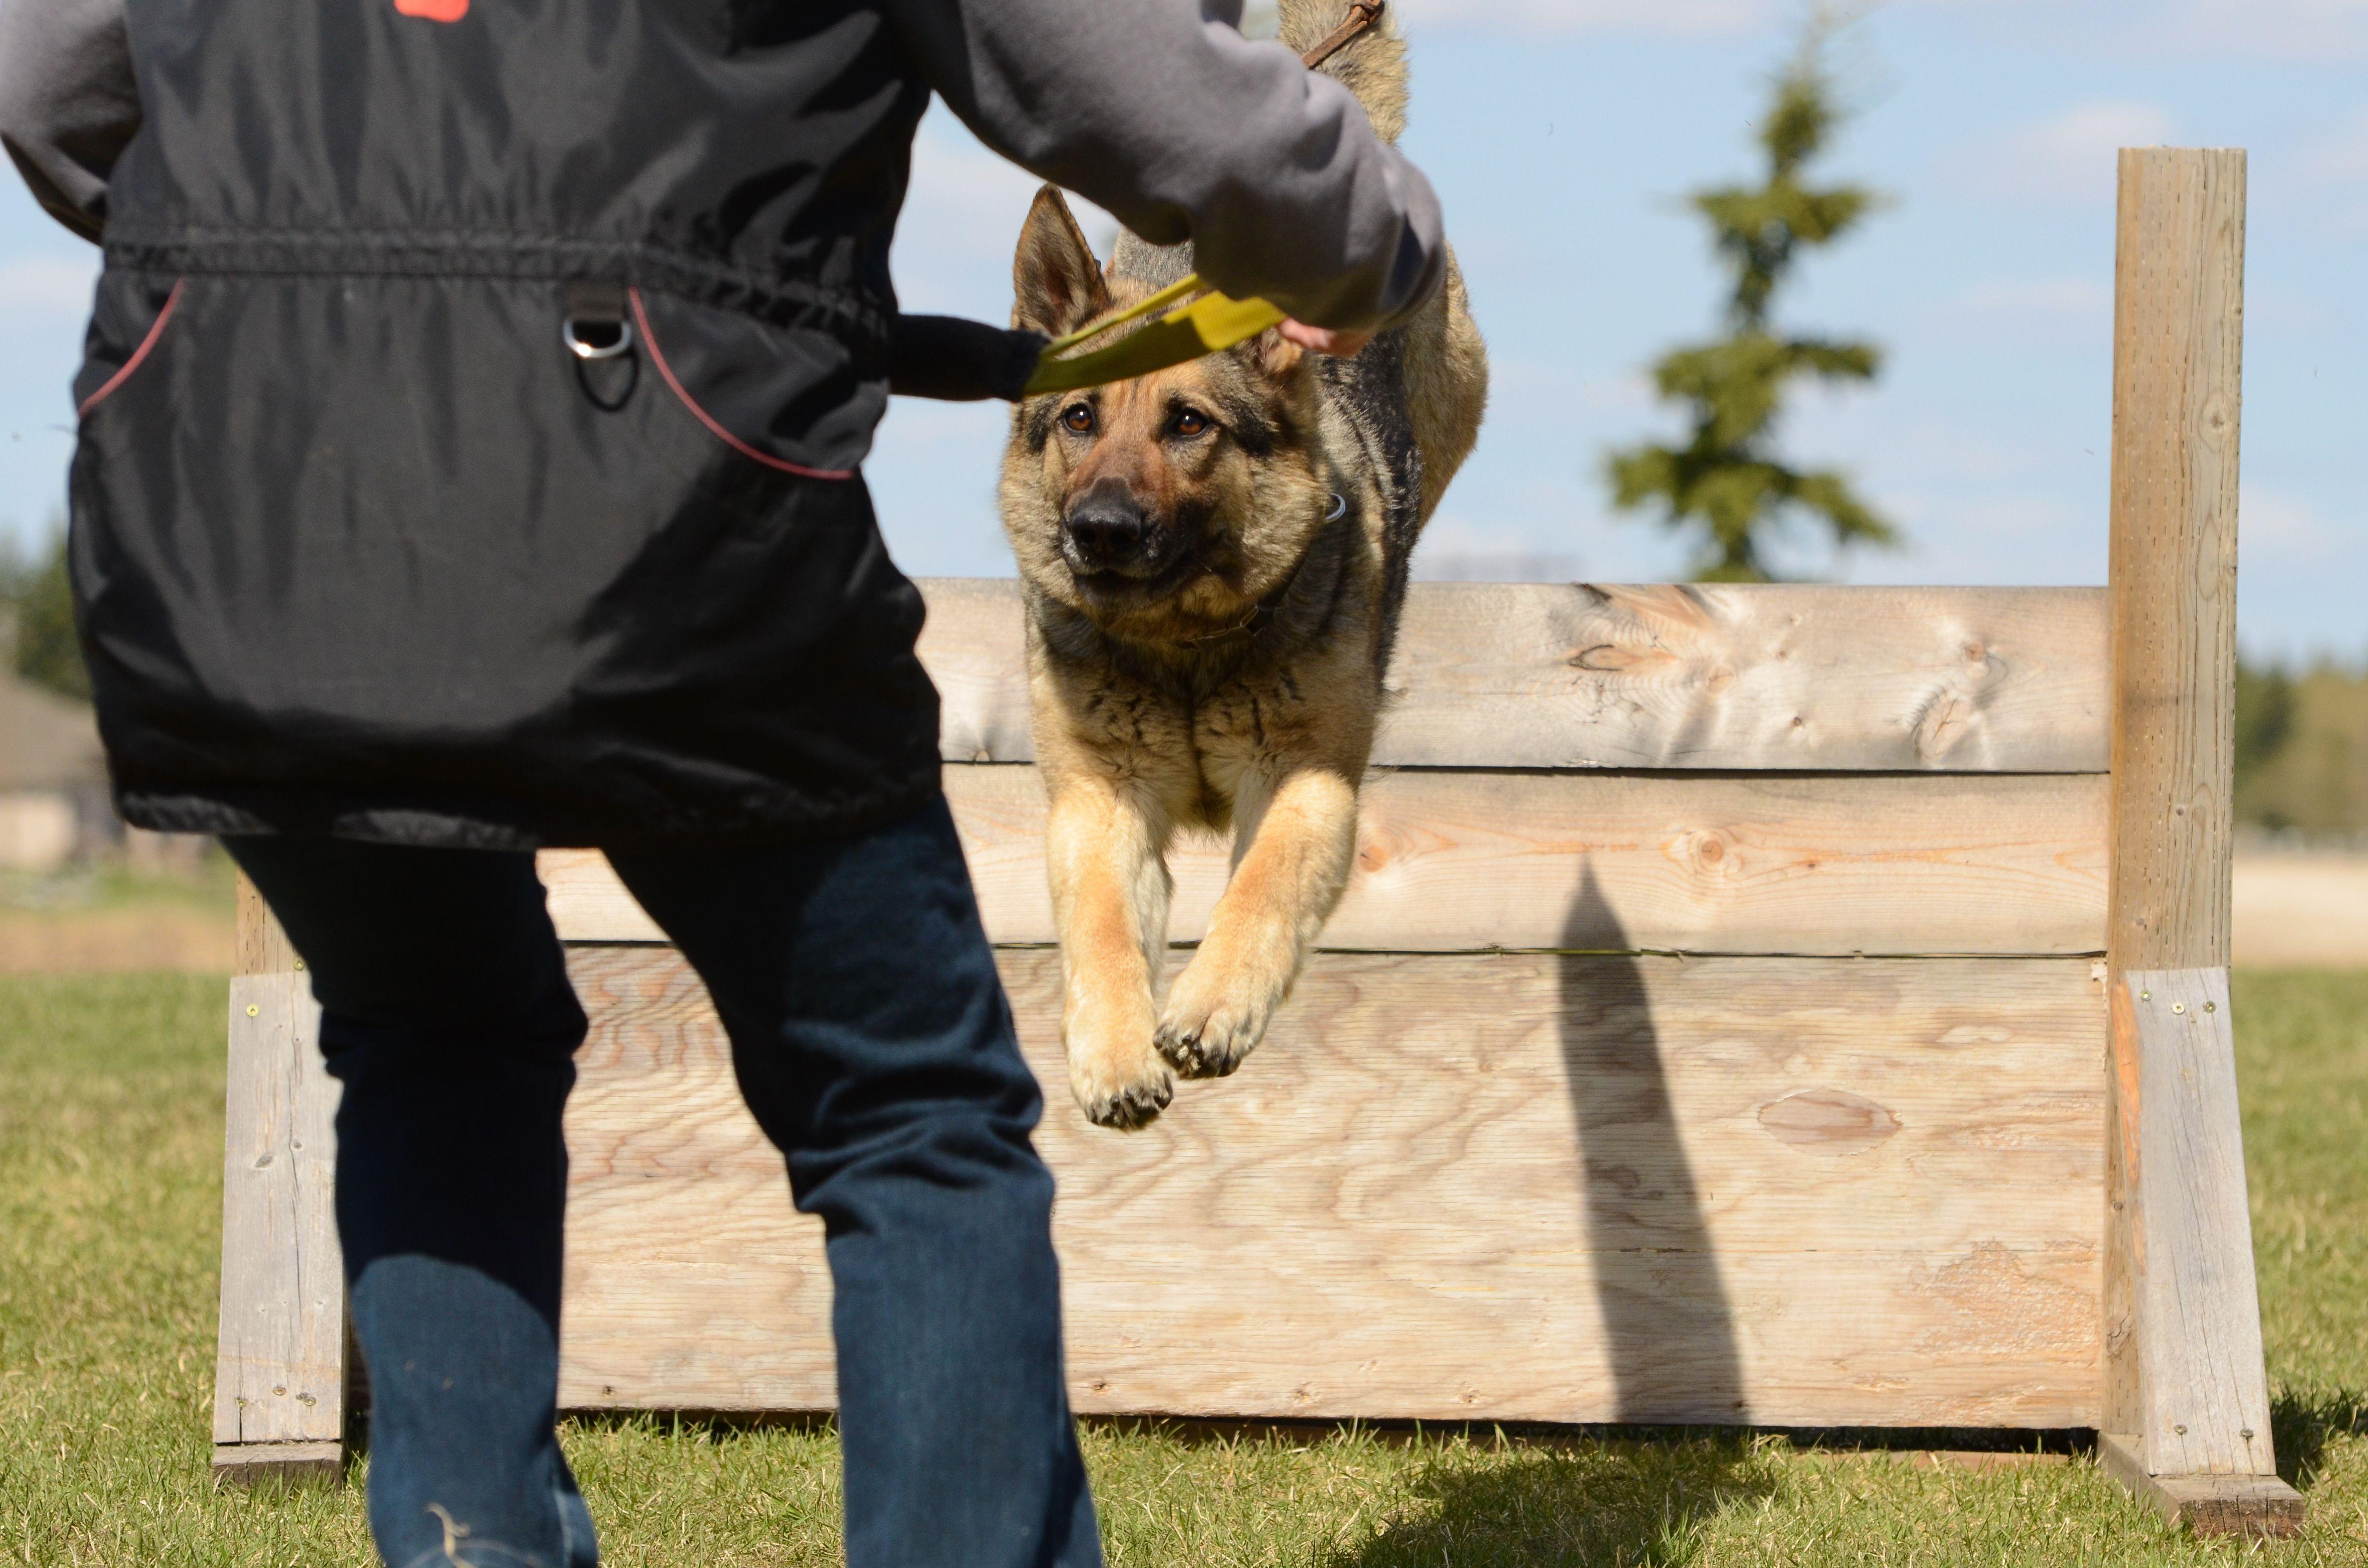 GermanShepherd, Schutzhund, GSD My German shepherd